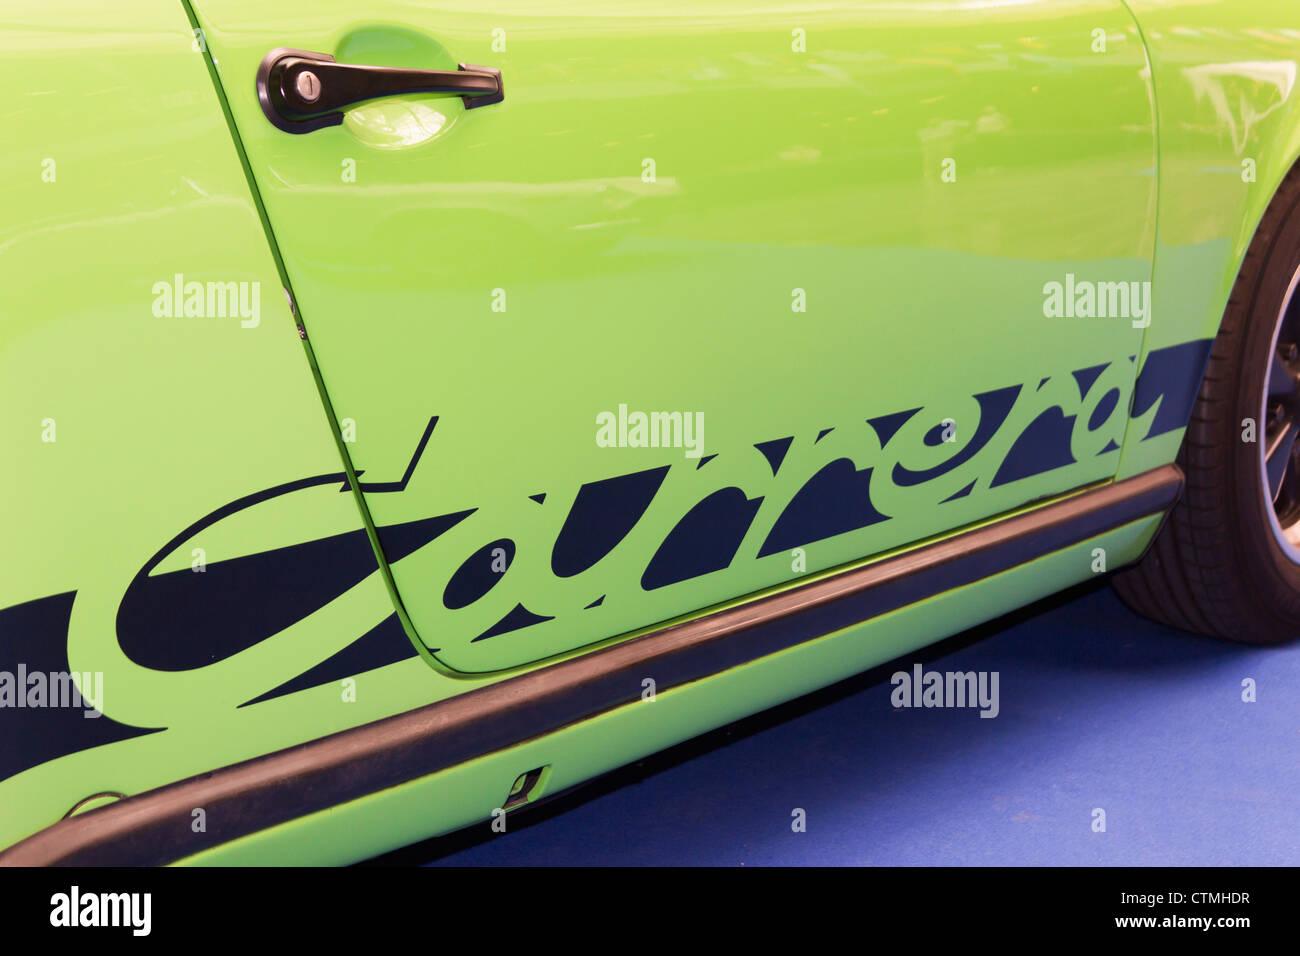 Detail des Porsche Carrera Sportwagen. Stockbild